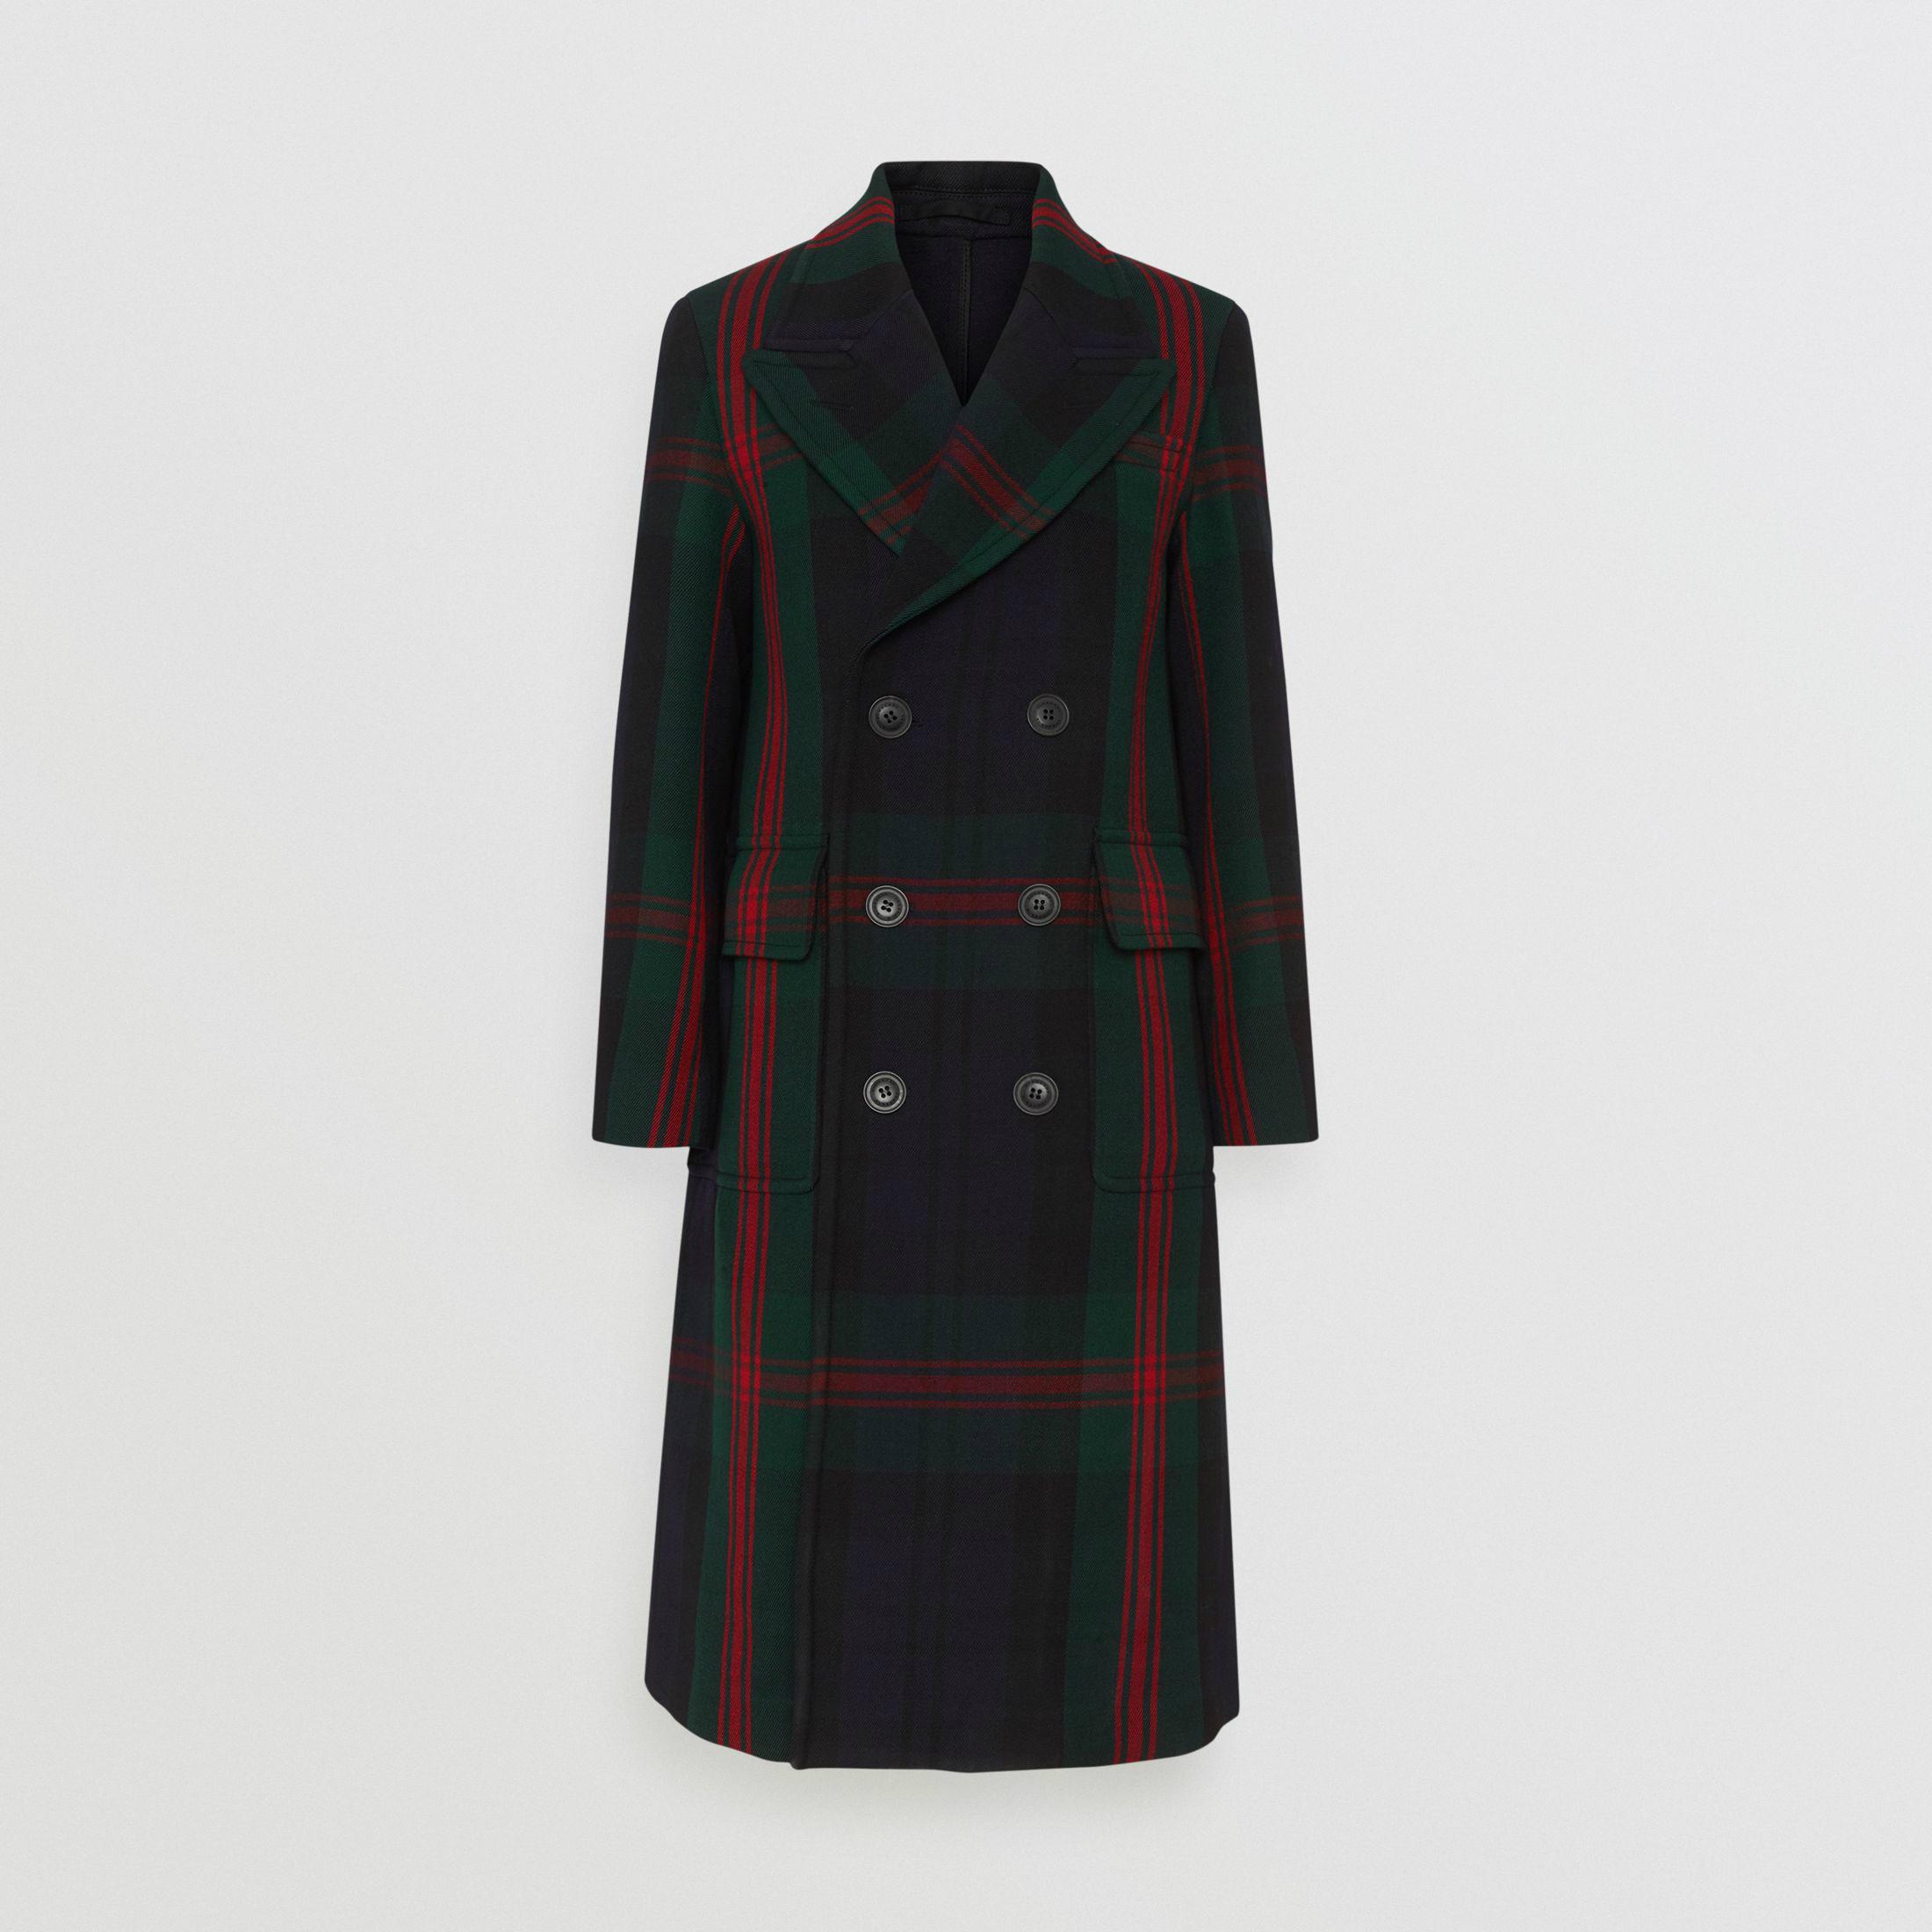 Burberry Plaid Topcoat.jpg